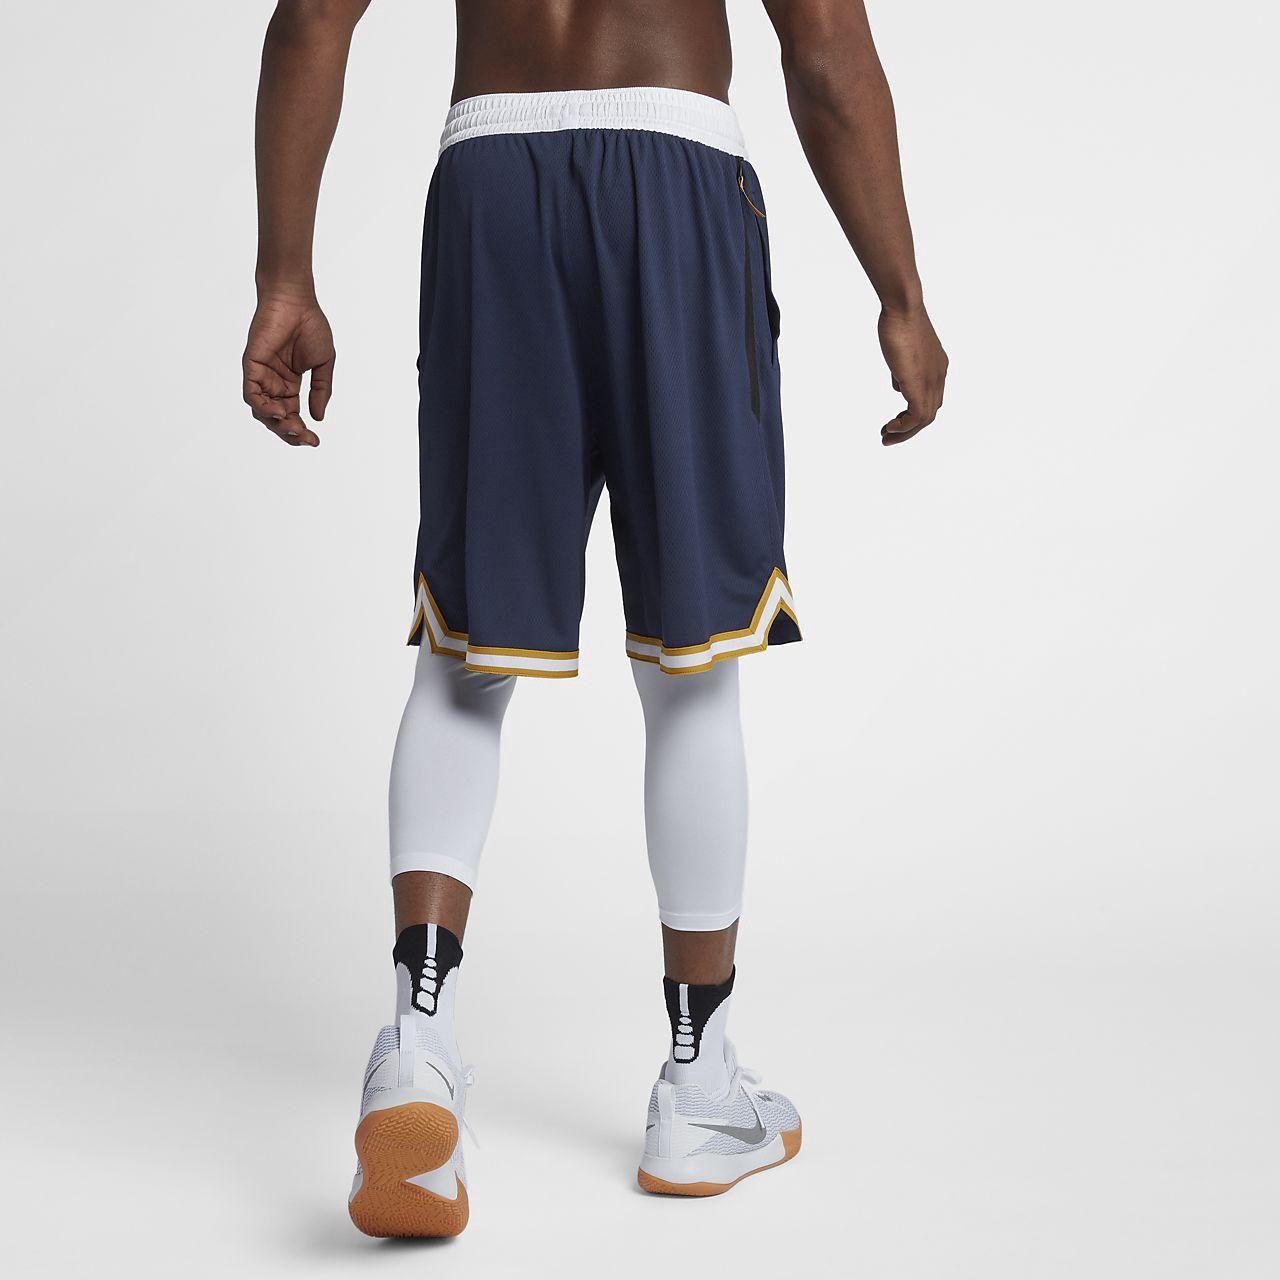 fe5848e6ecfa Nike Dri-Fit Dna Men s Basketball Shorts - XL